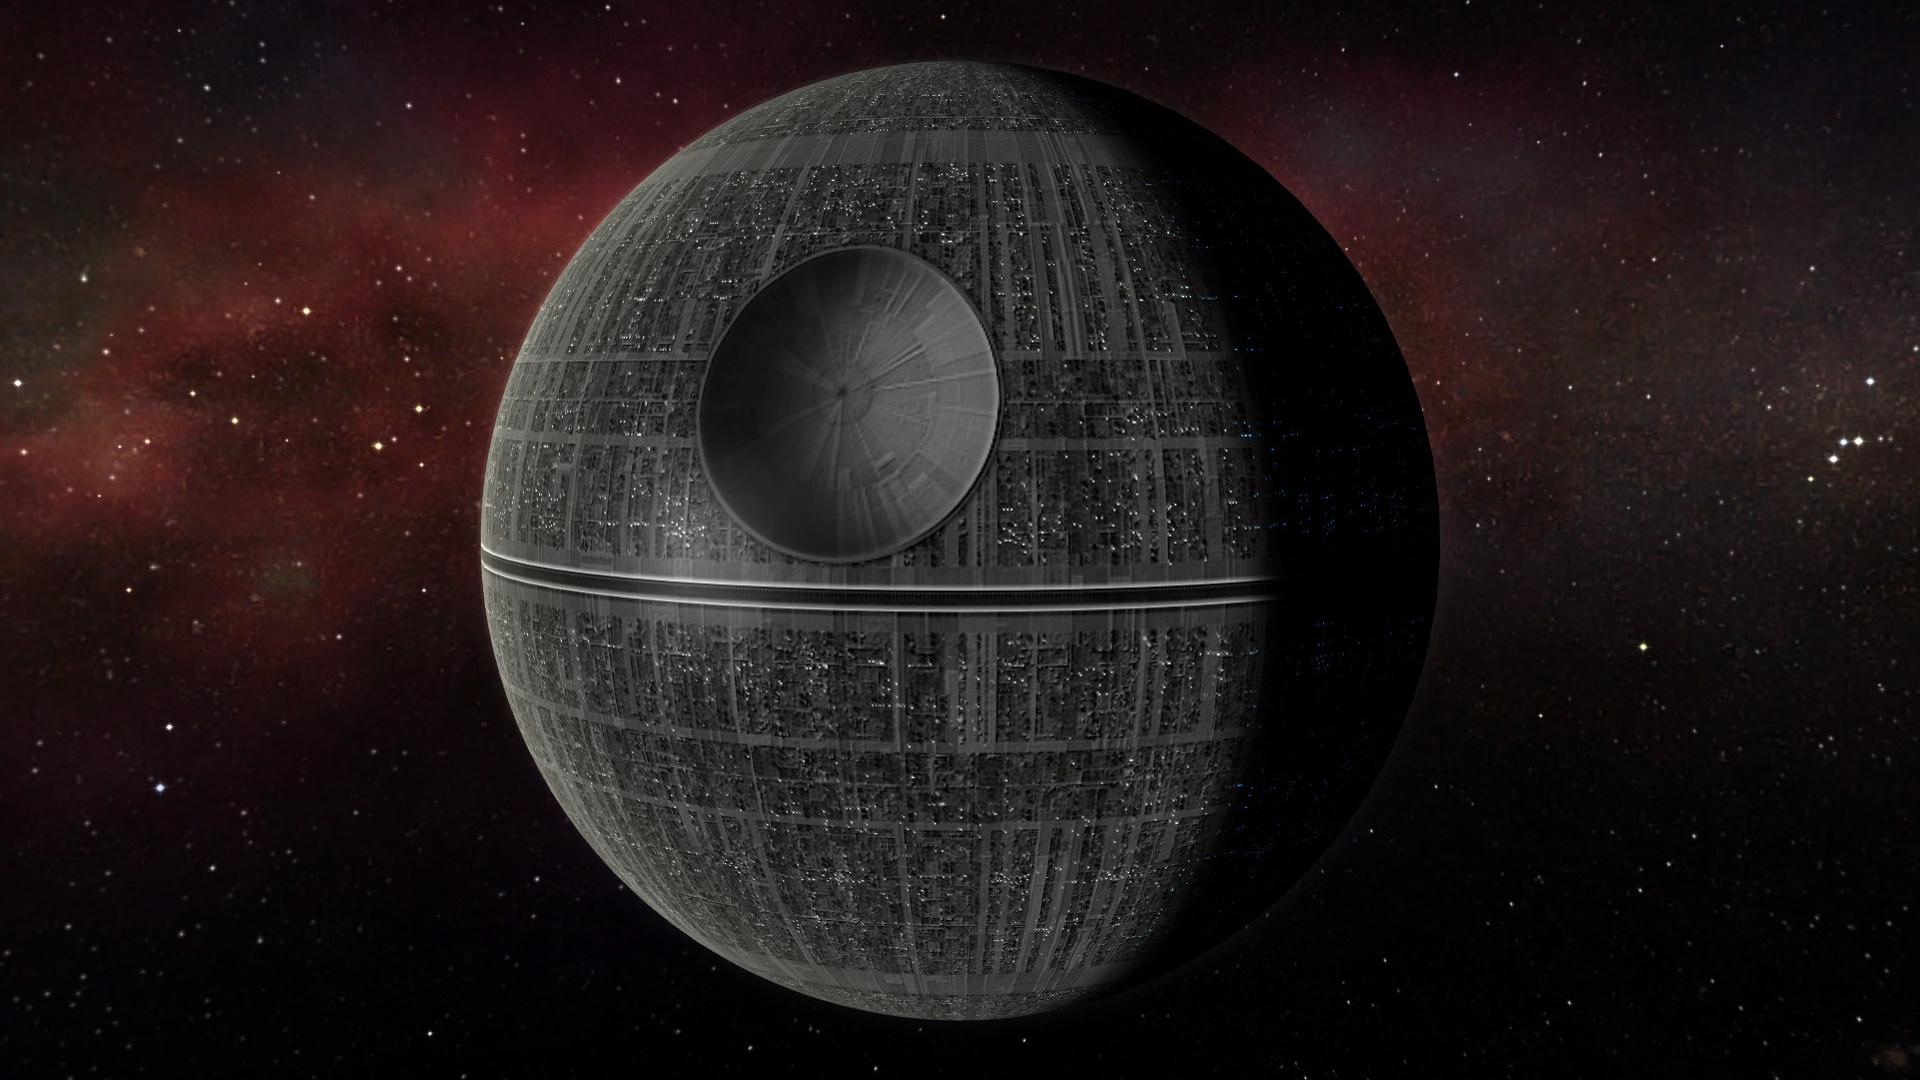 Free Download Star Wars Death Star Hd Backgrounds Fizx 1920x1200 For Your Desktop Mobile Tablet Explore 75 Death Star Wallpaper Death Star Hd Wallpaper Death Star Hangar Wallpaper Death